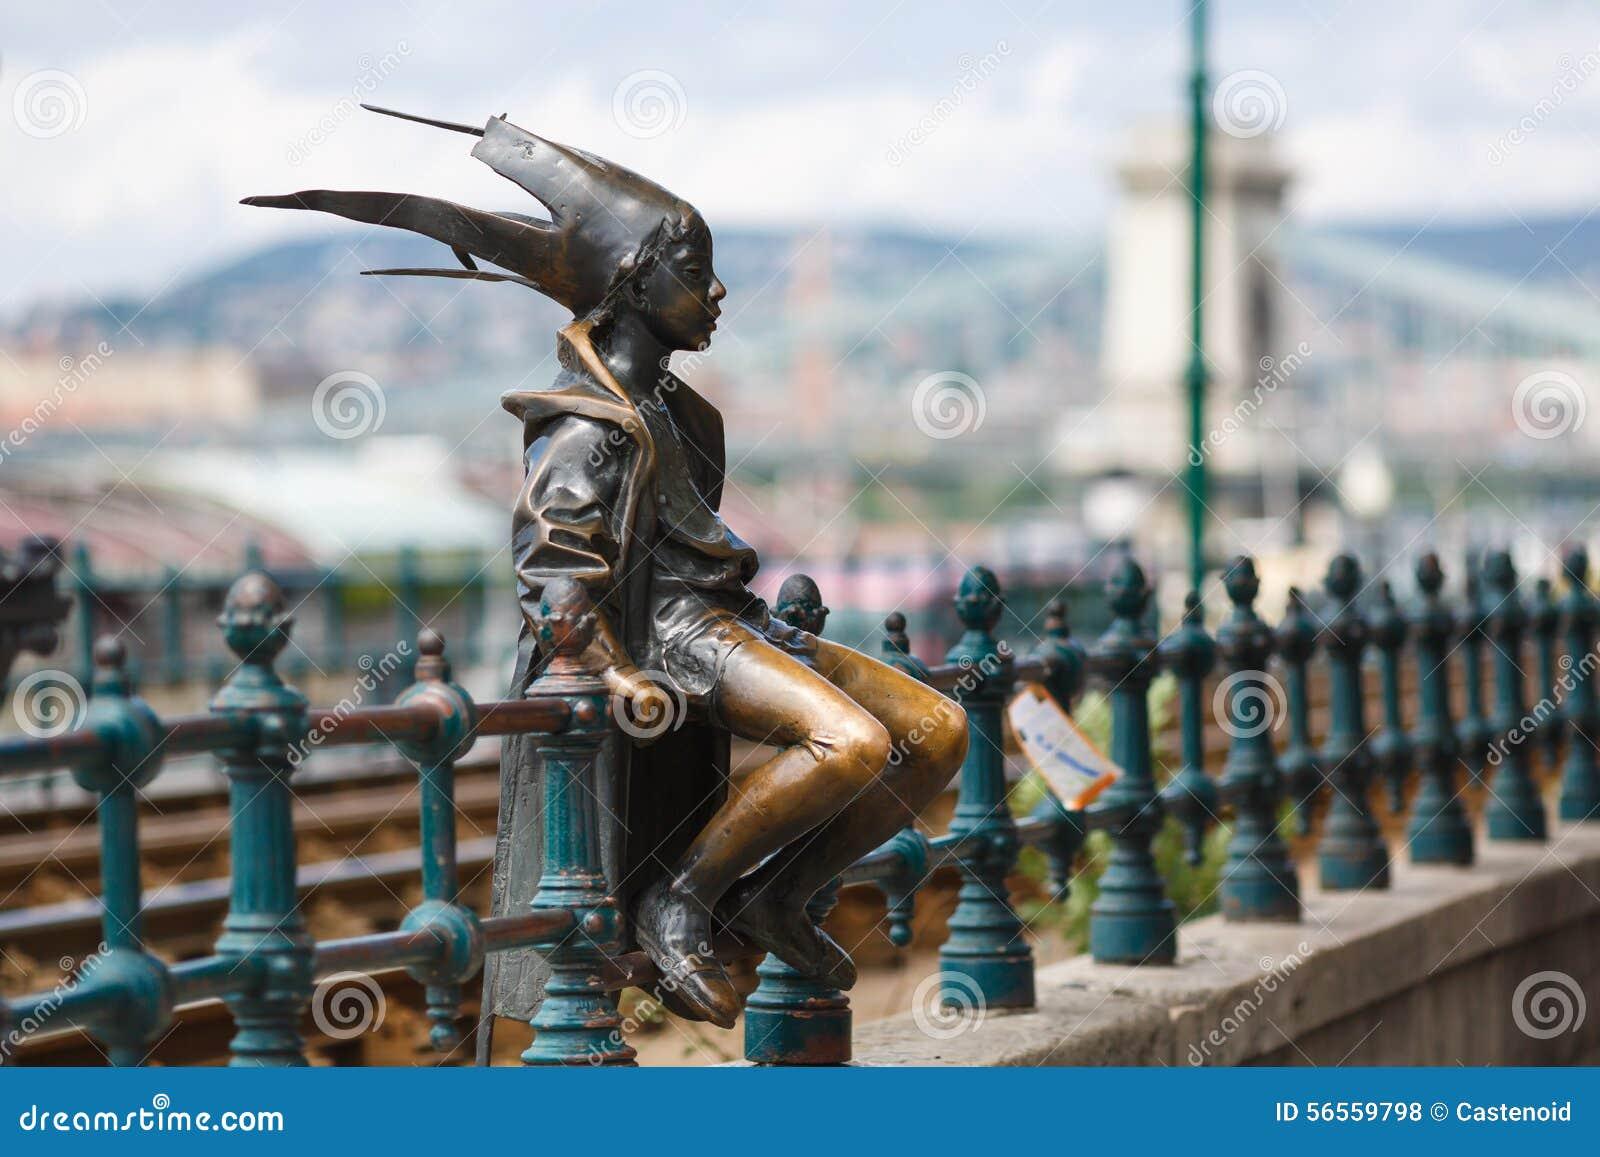 Download Το μικρό Jester πριγκηπισσών άγαλμα Στοκ Εικόνες - εικόνα από γλυπτό, alon: 56559798